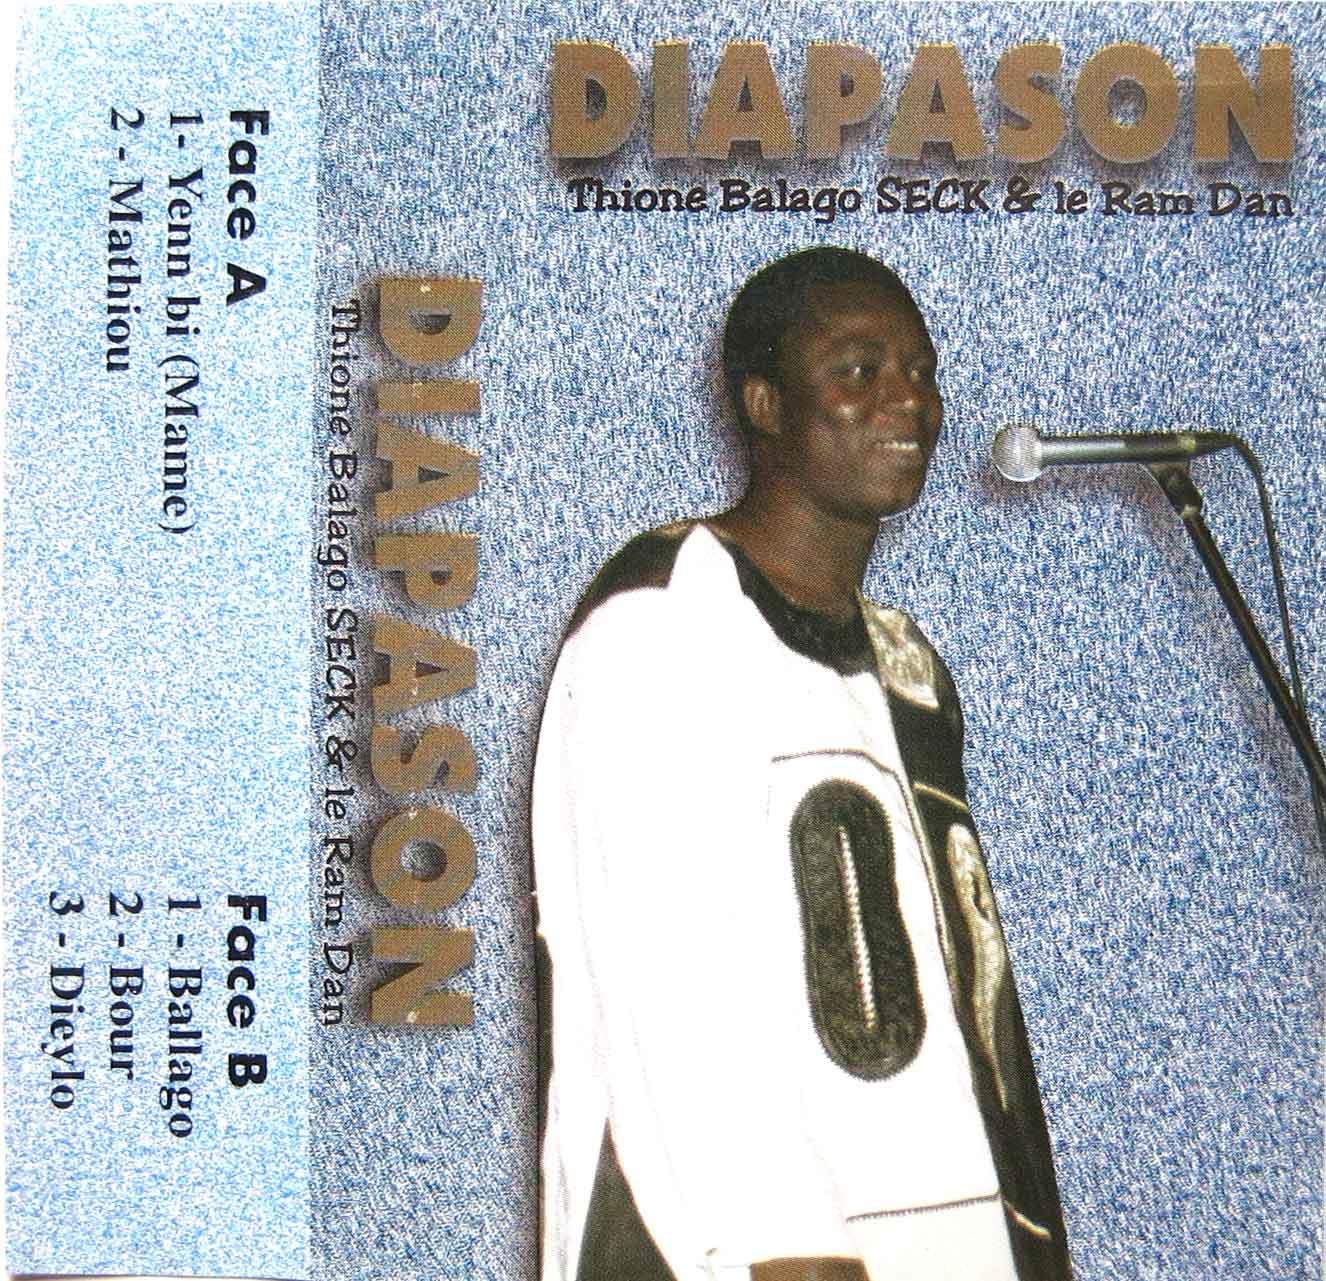 Thione Balago Seck & Le Ram Dan – Diapason Vol.1 SENEGAL Mbalax Music ALBUM